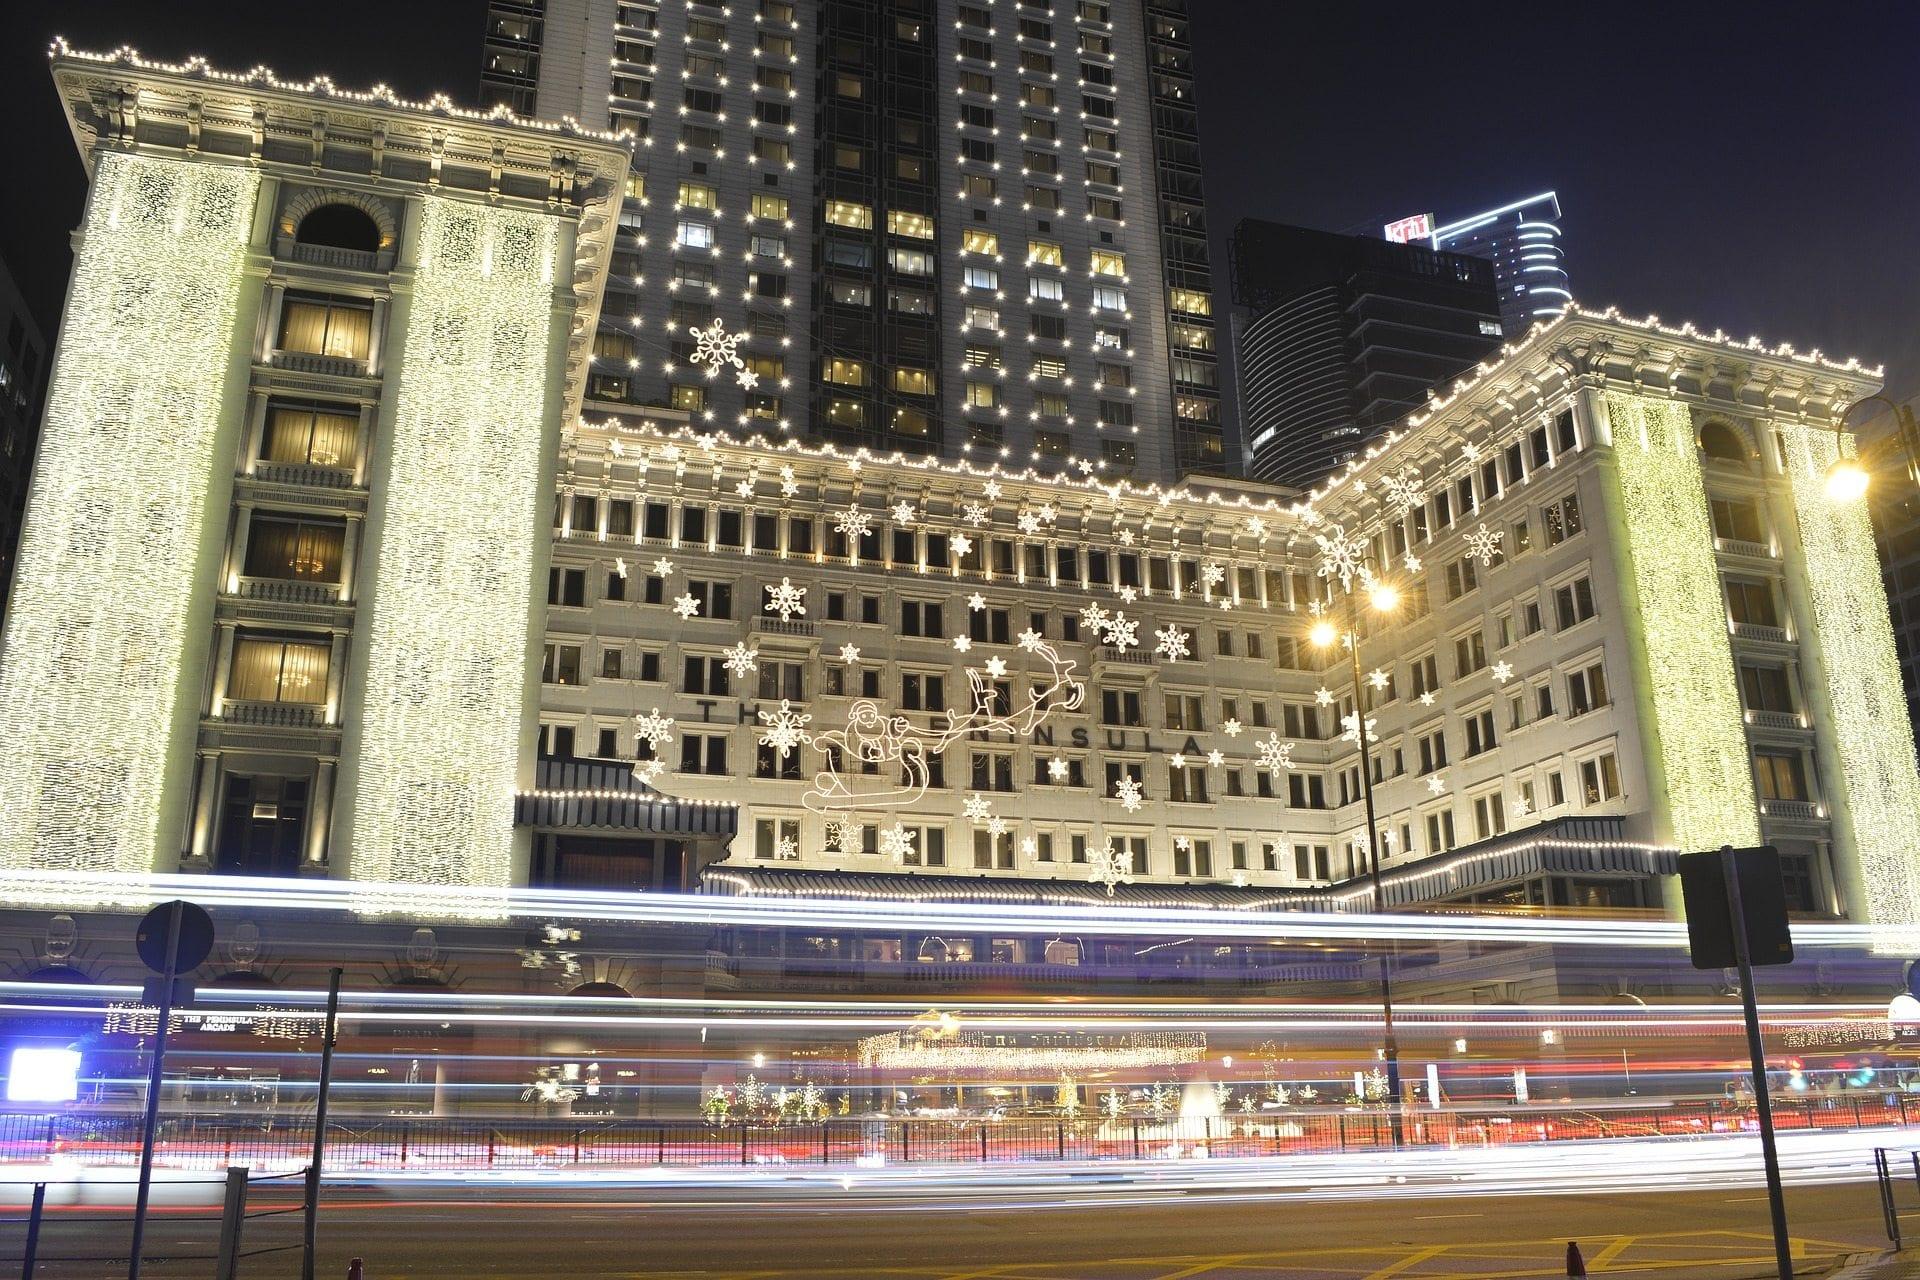 hongkong hotel weihnachten. Black Bedroom Furniture Sets. Home Design Ideas